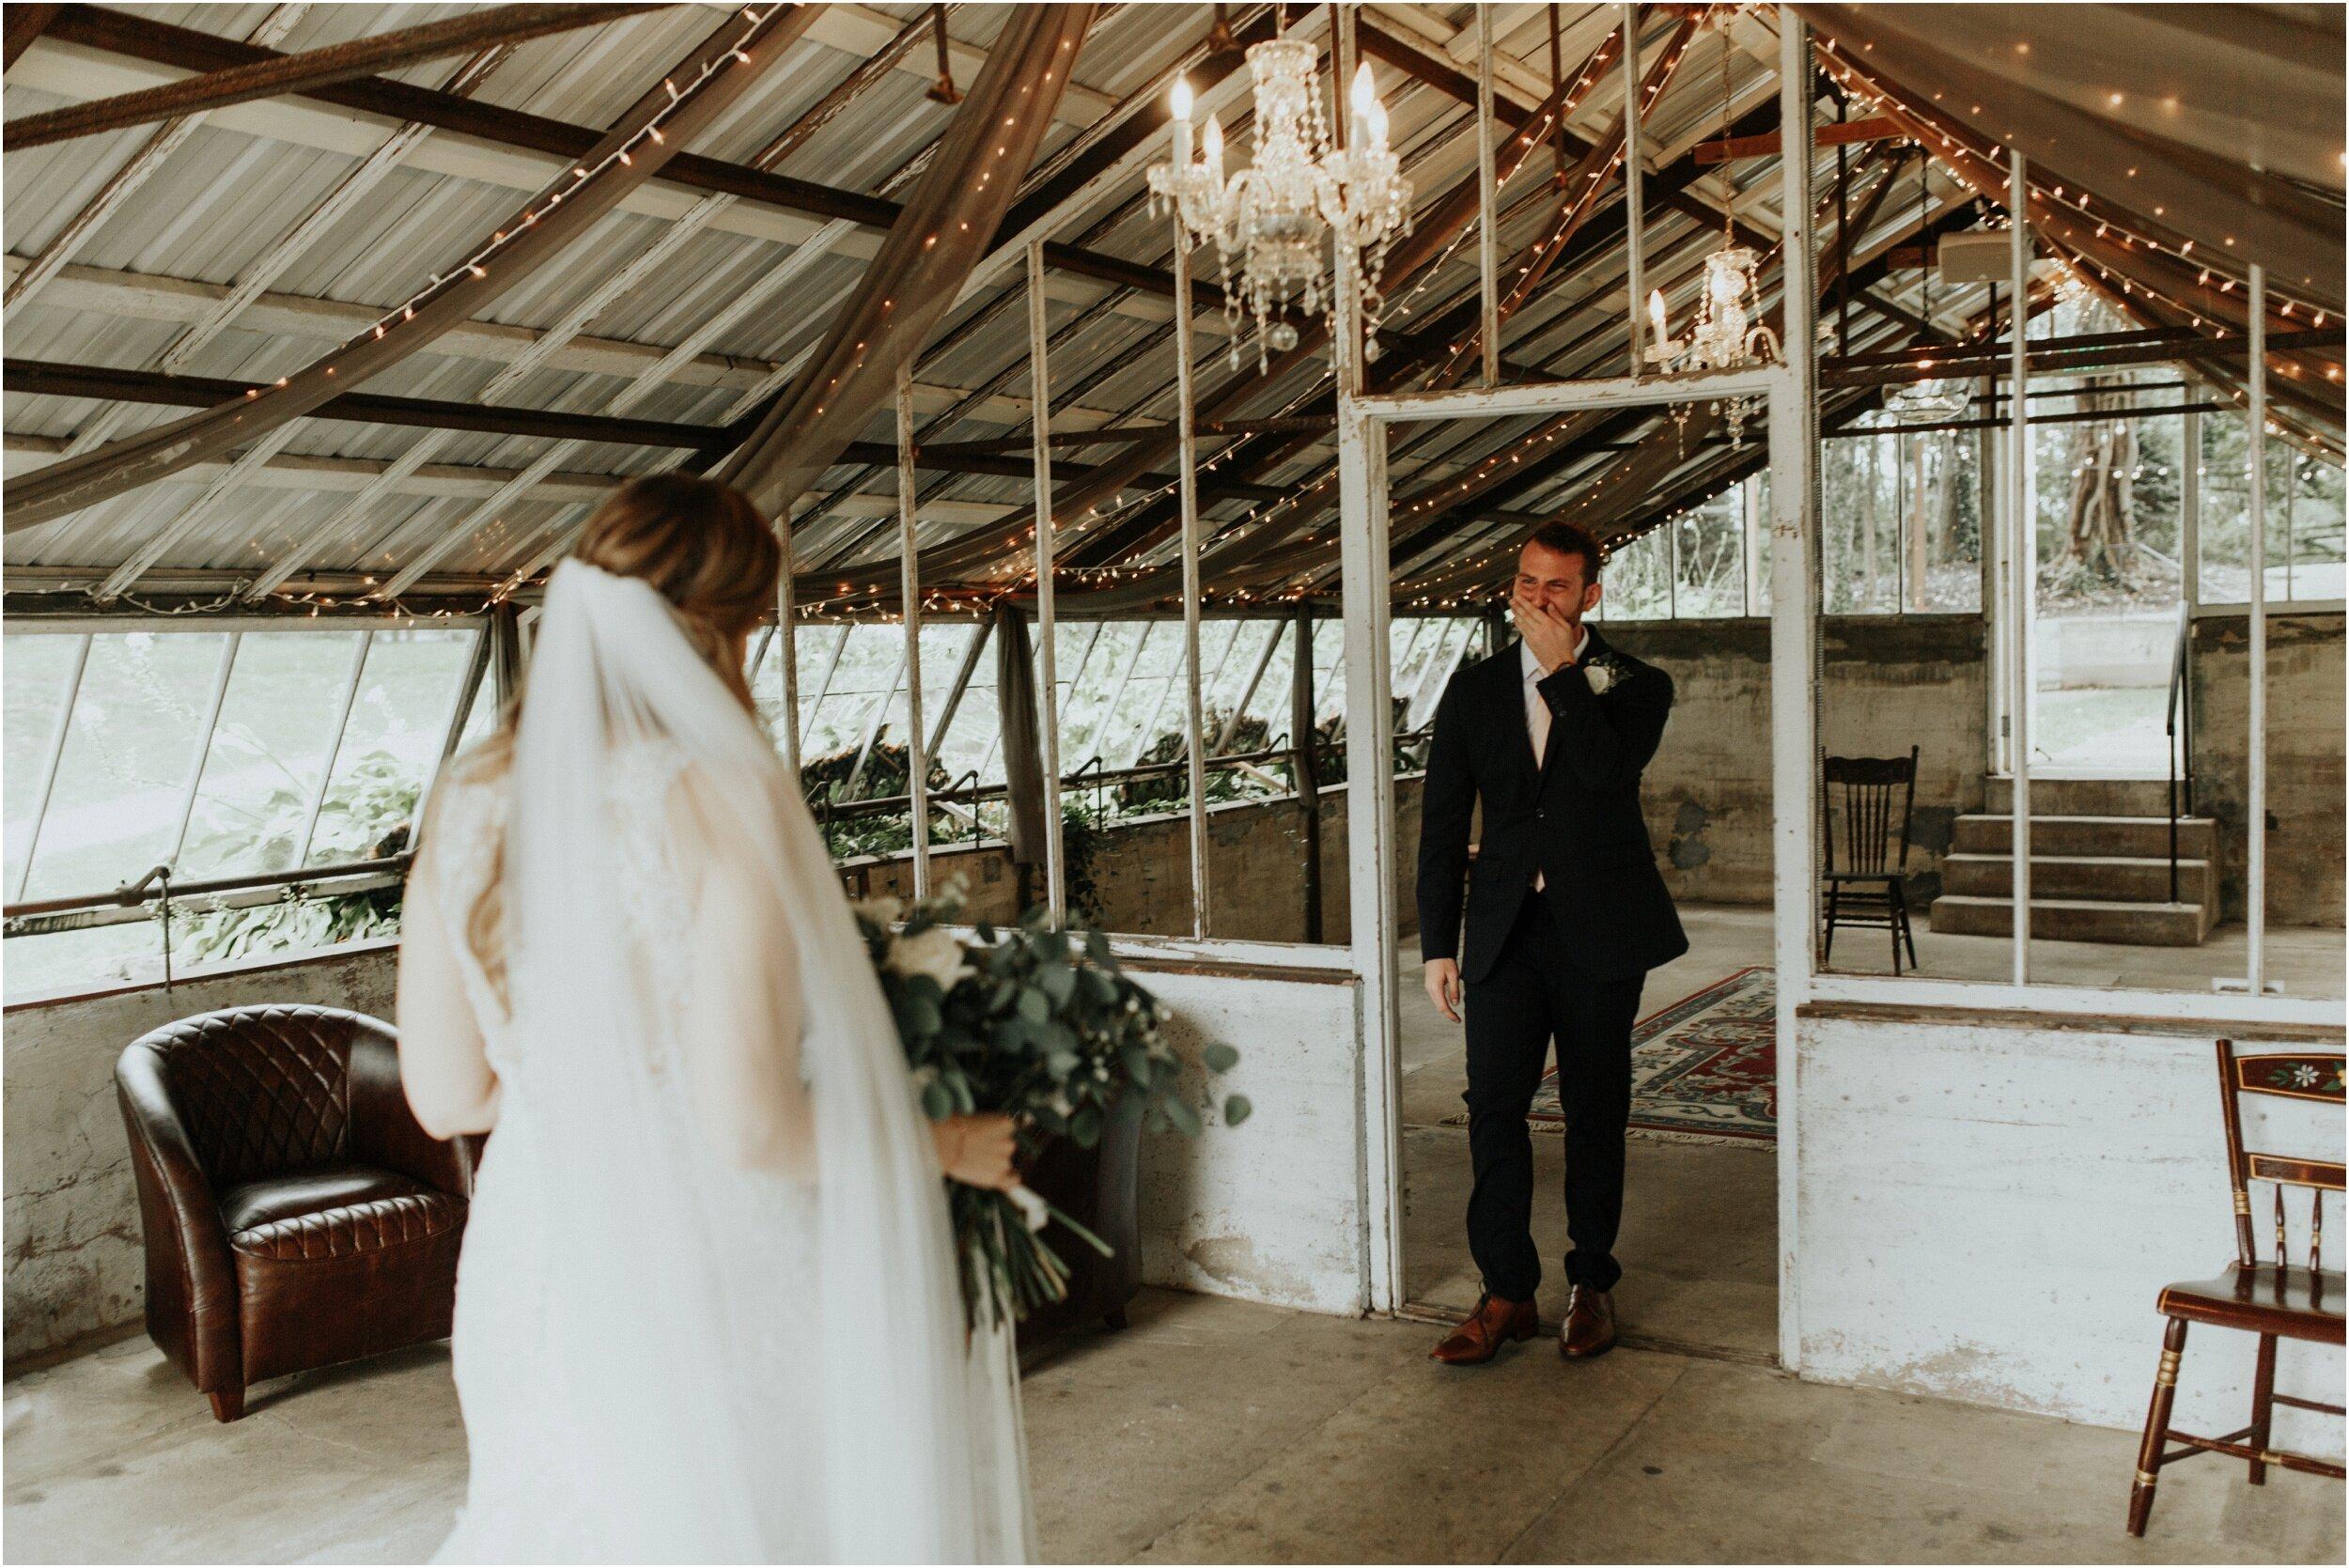 steph-and-jordan-cox-our-wedding-historic-shady-lane-compass-wedding-collective-hazel-lining-photography-destination-elopement-wedding-engagement-photography_0033.jpg